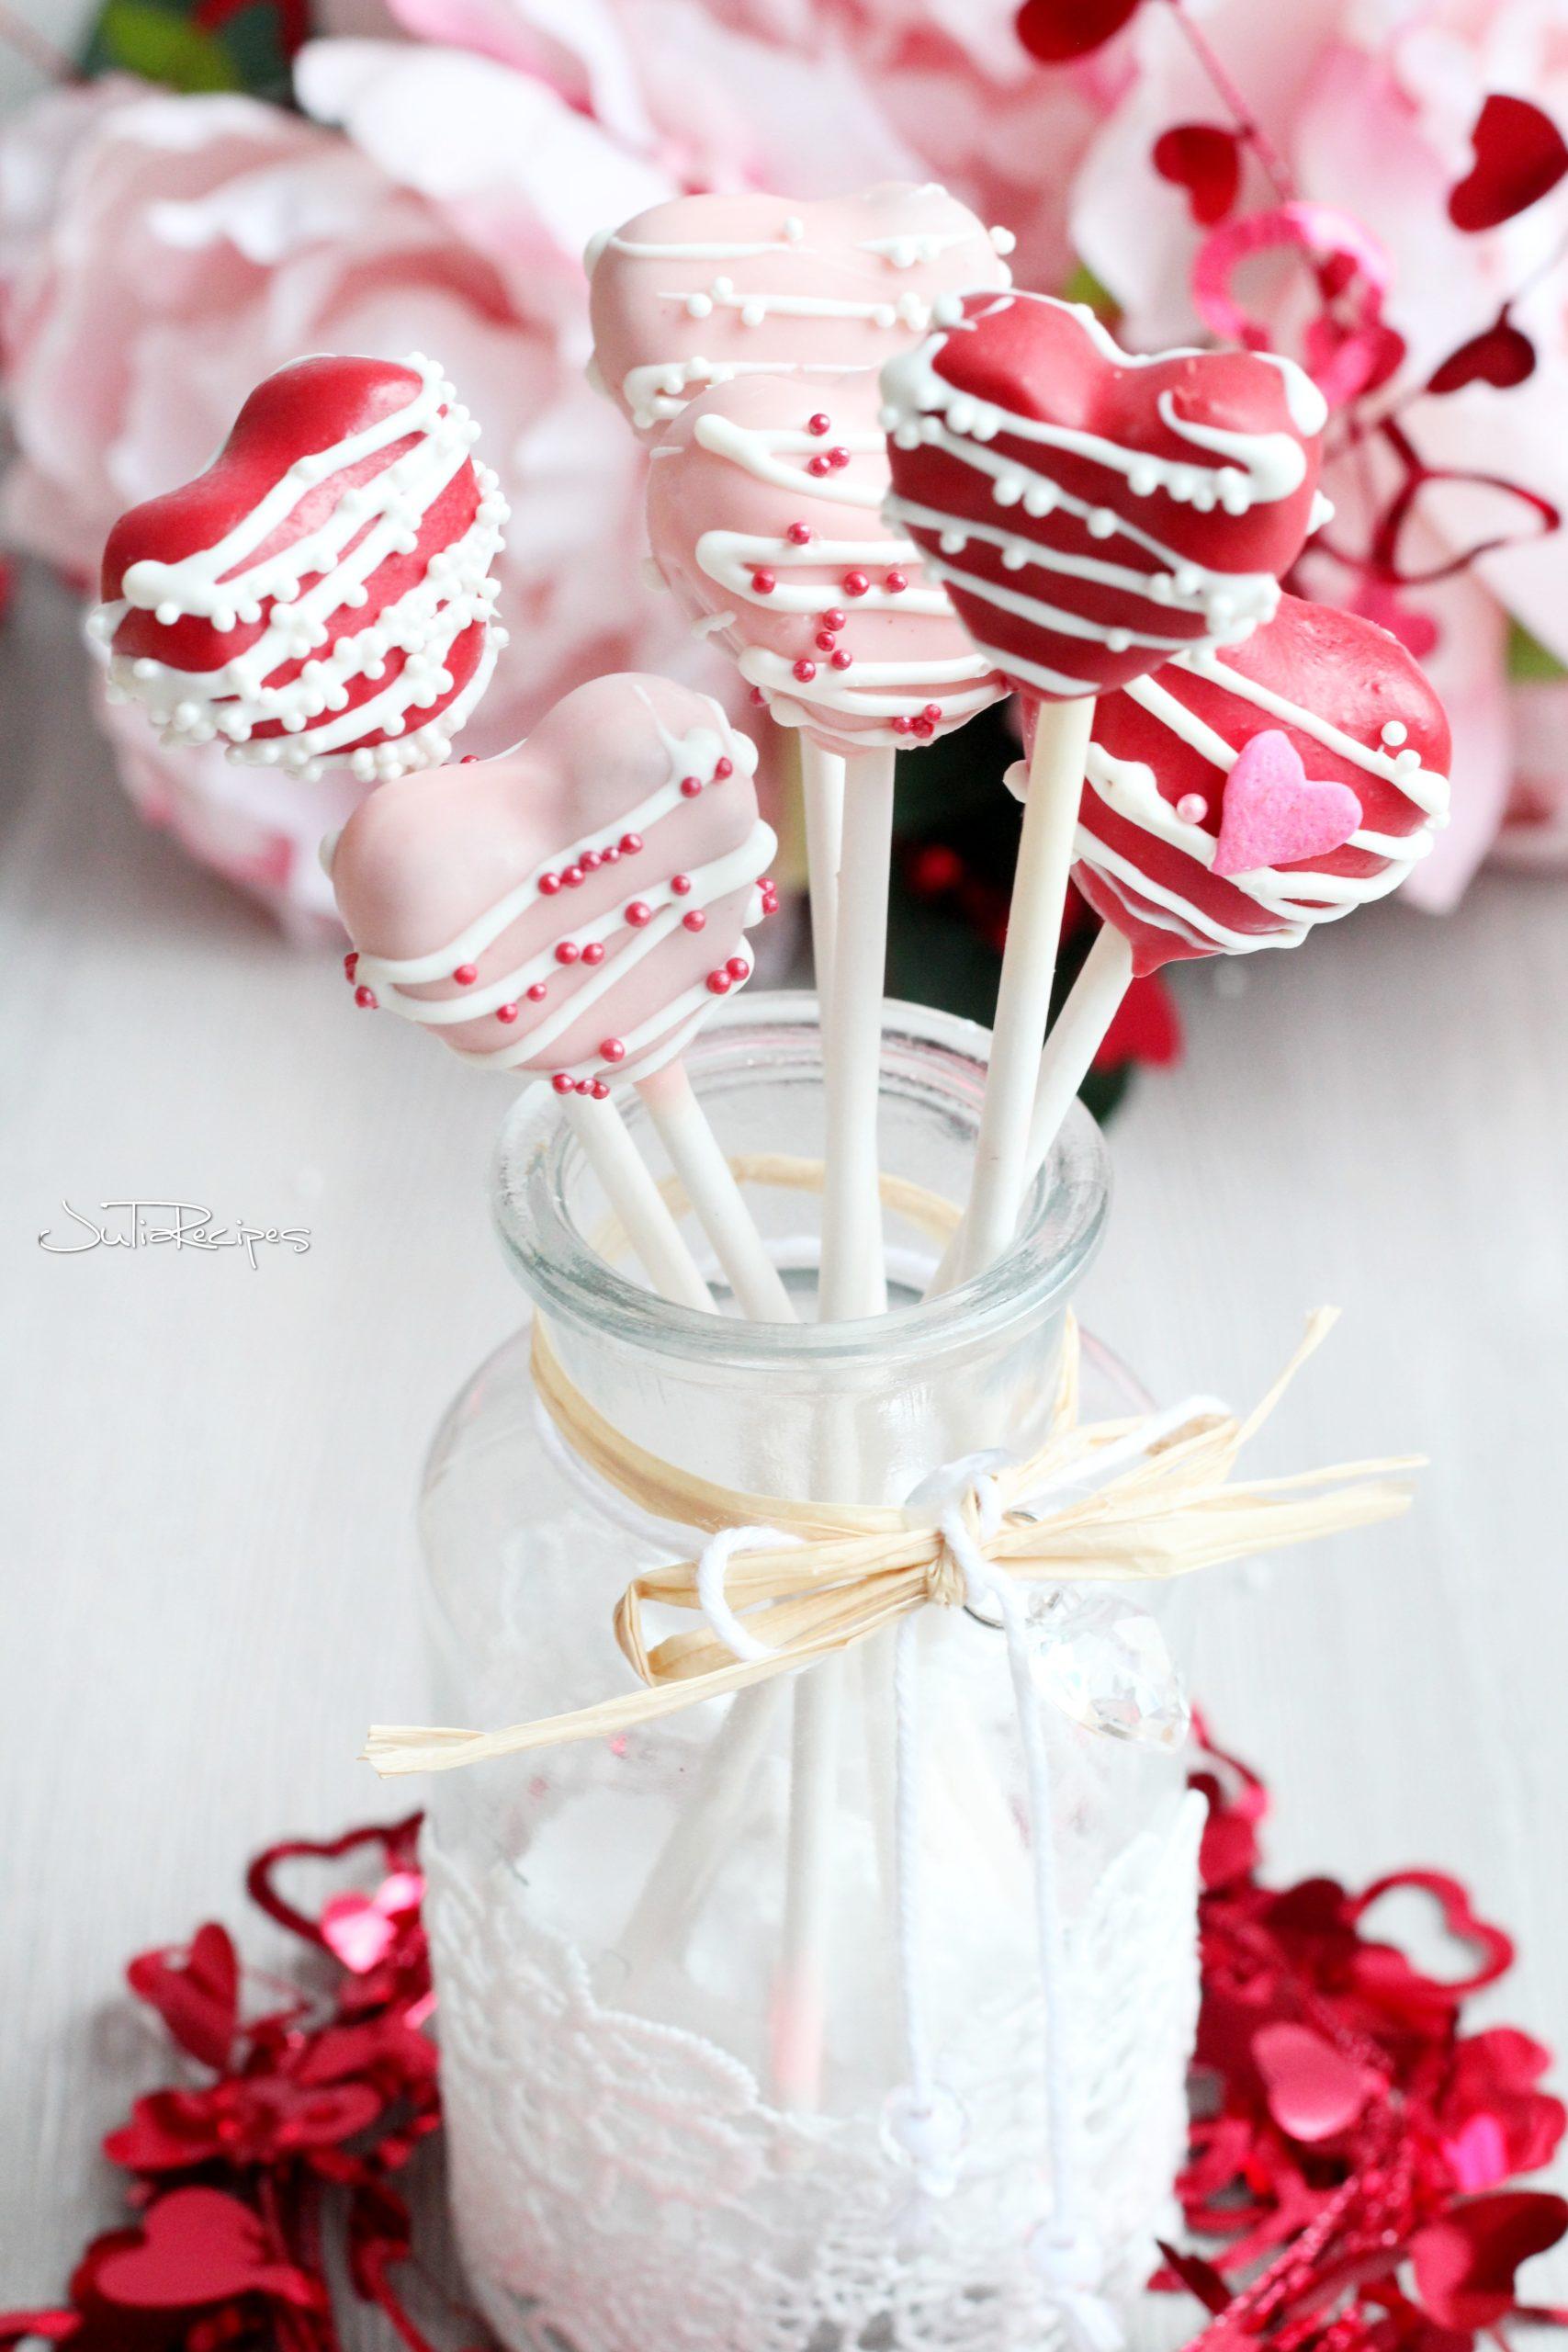 heart cake pops in glass